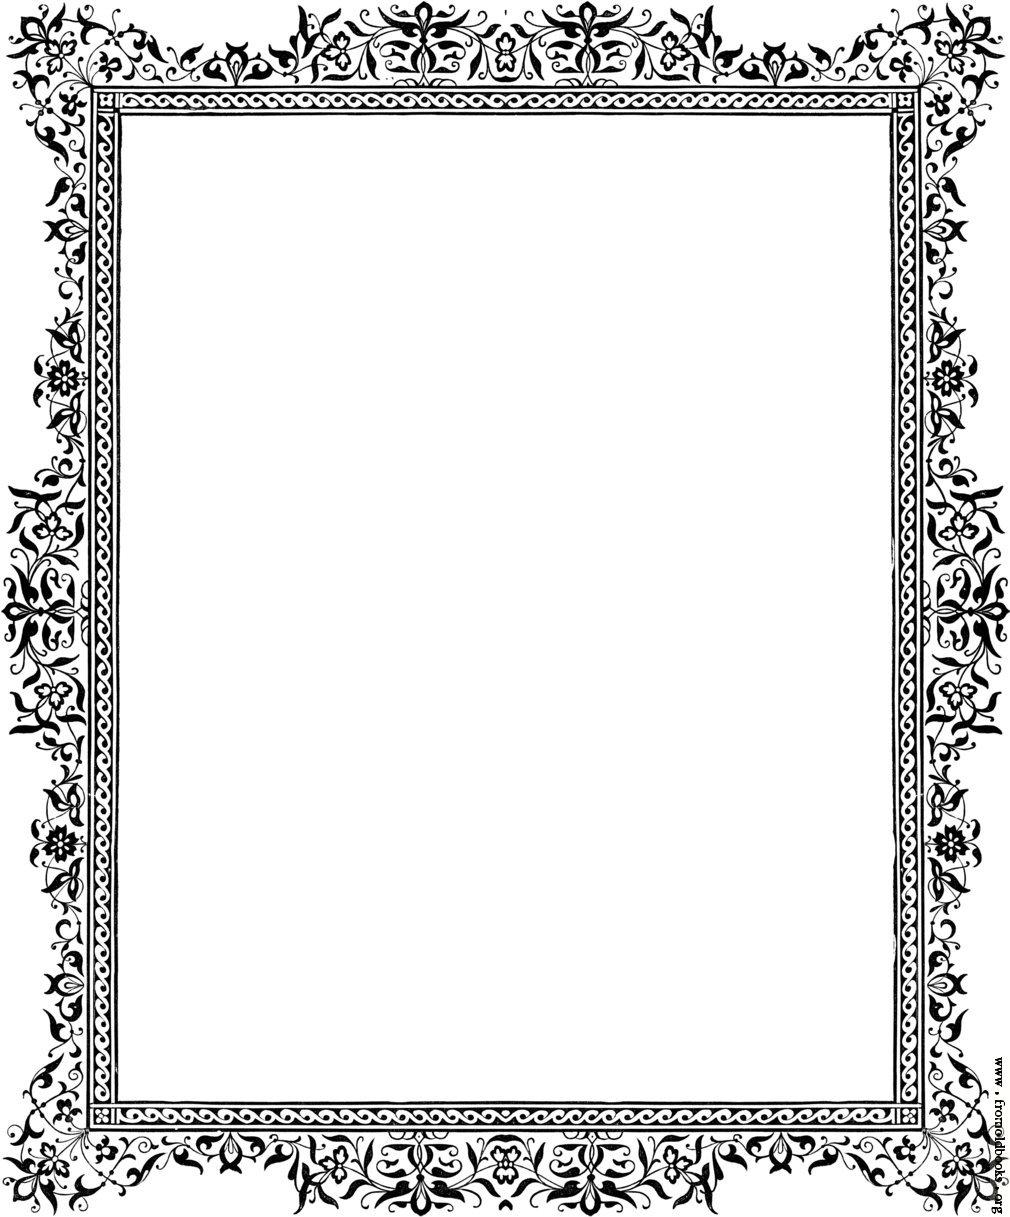 Free Border Designs Clip Art